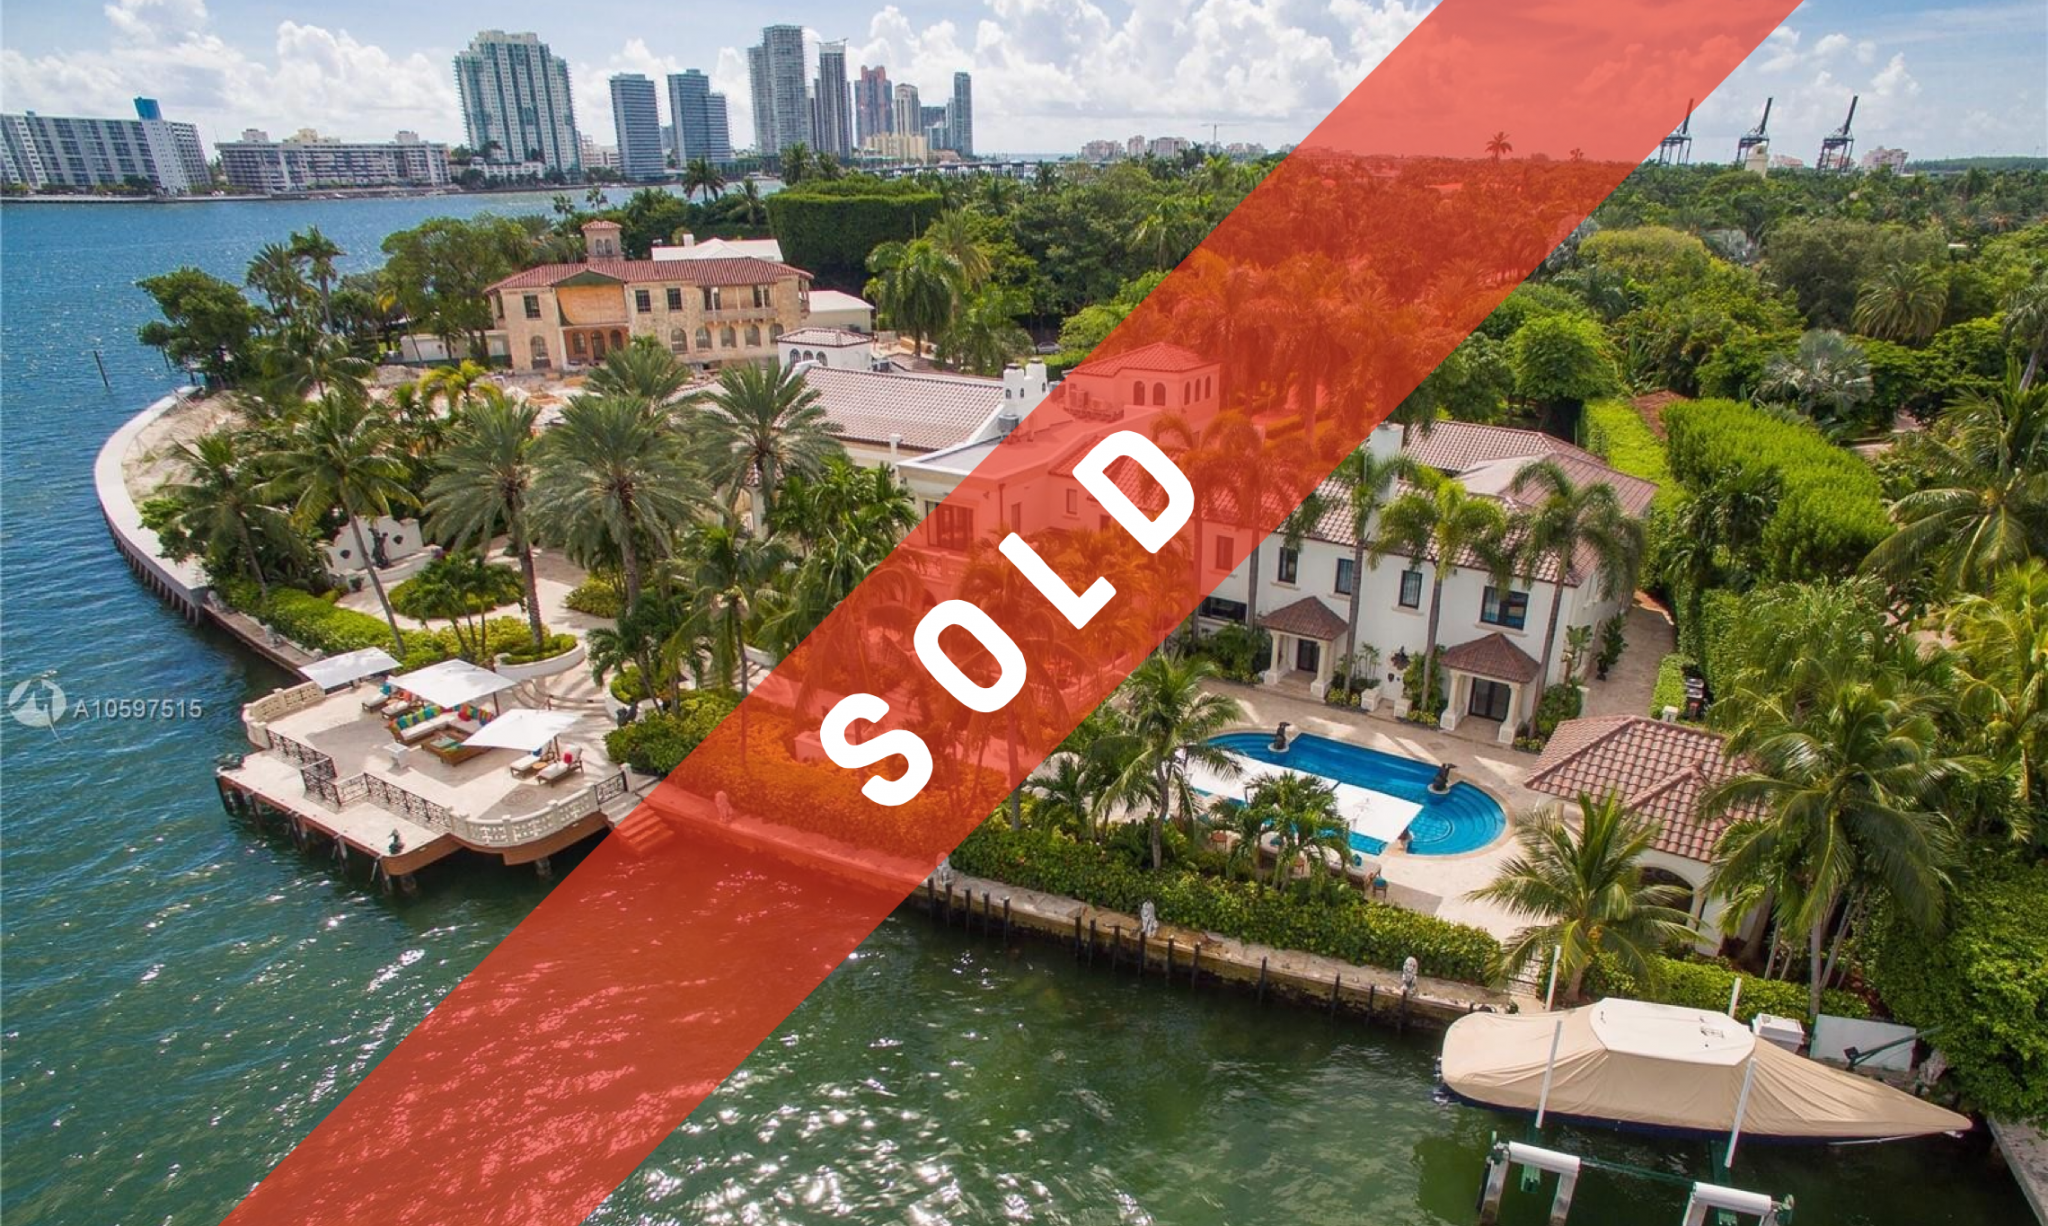 House STAR ISLAND 46 Star Island Dr - Miami Beach, USA for sale For Super Rich